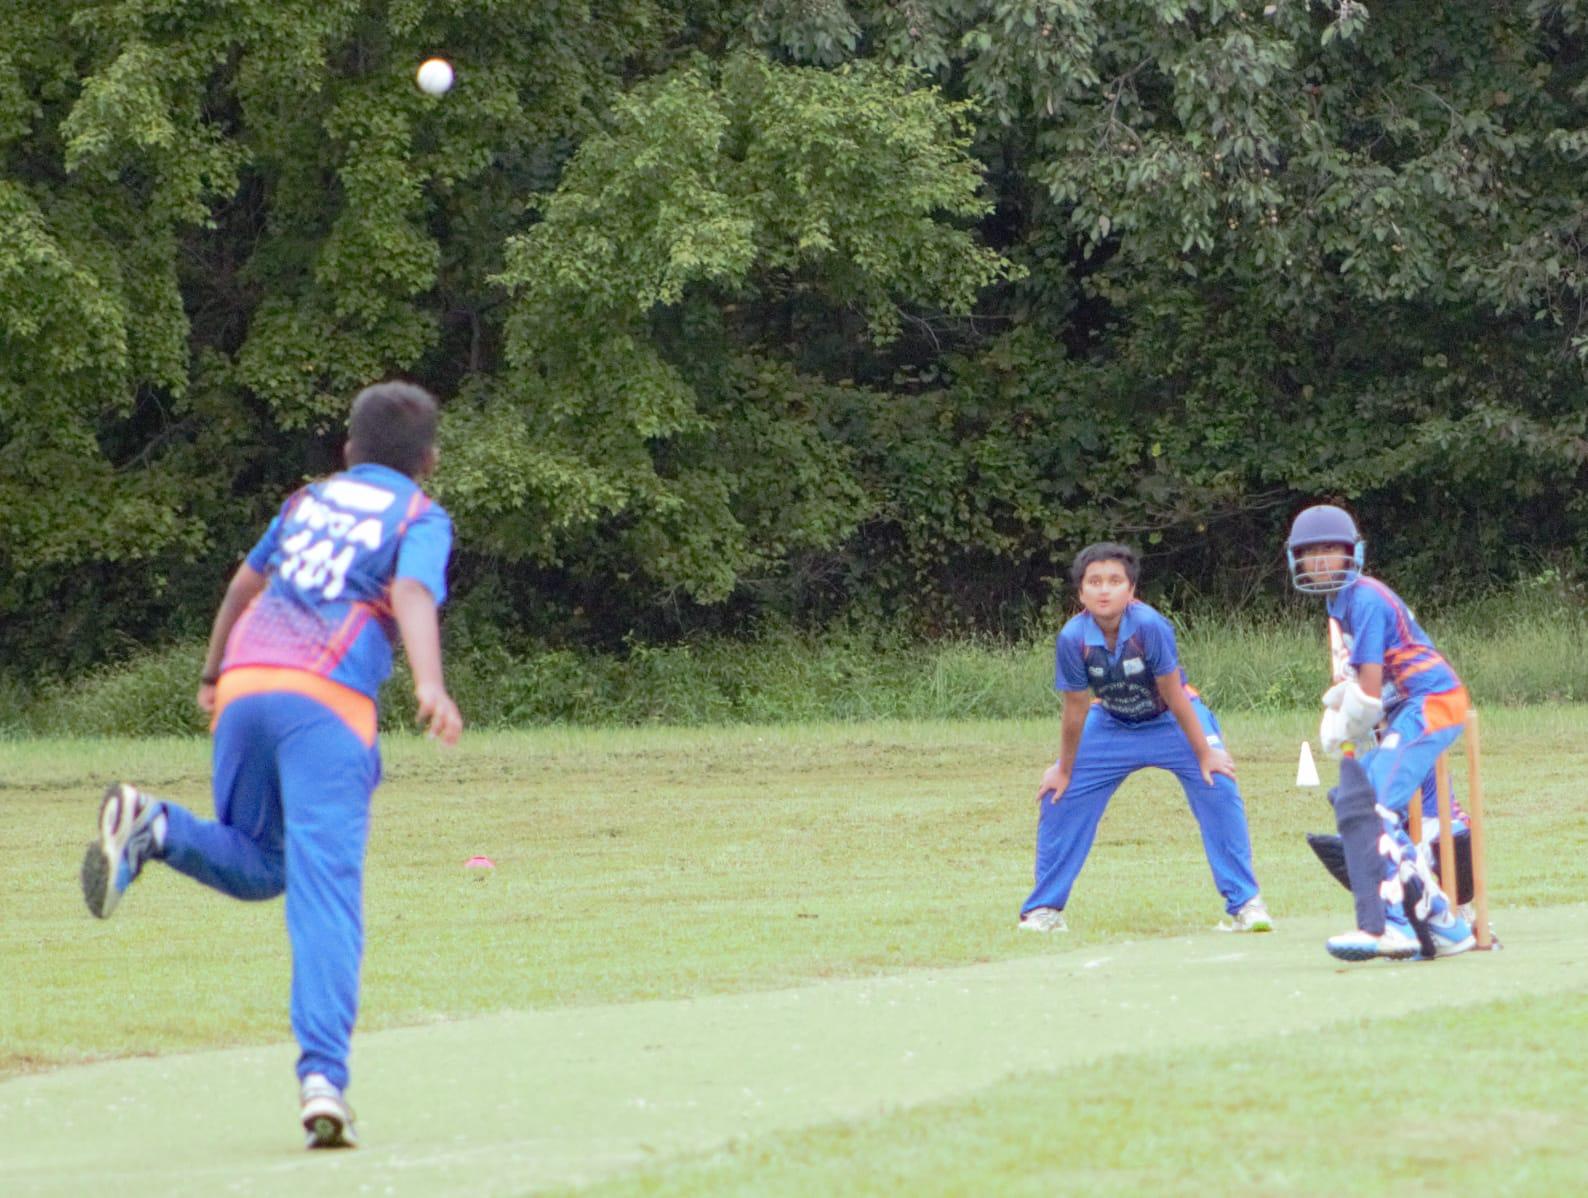 Match practice